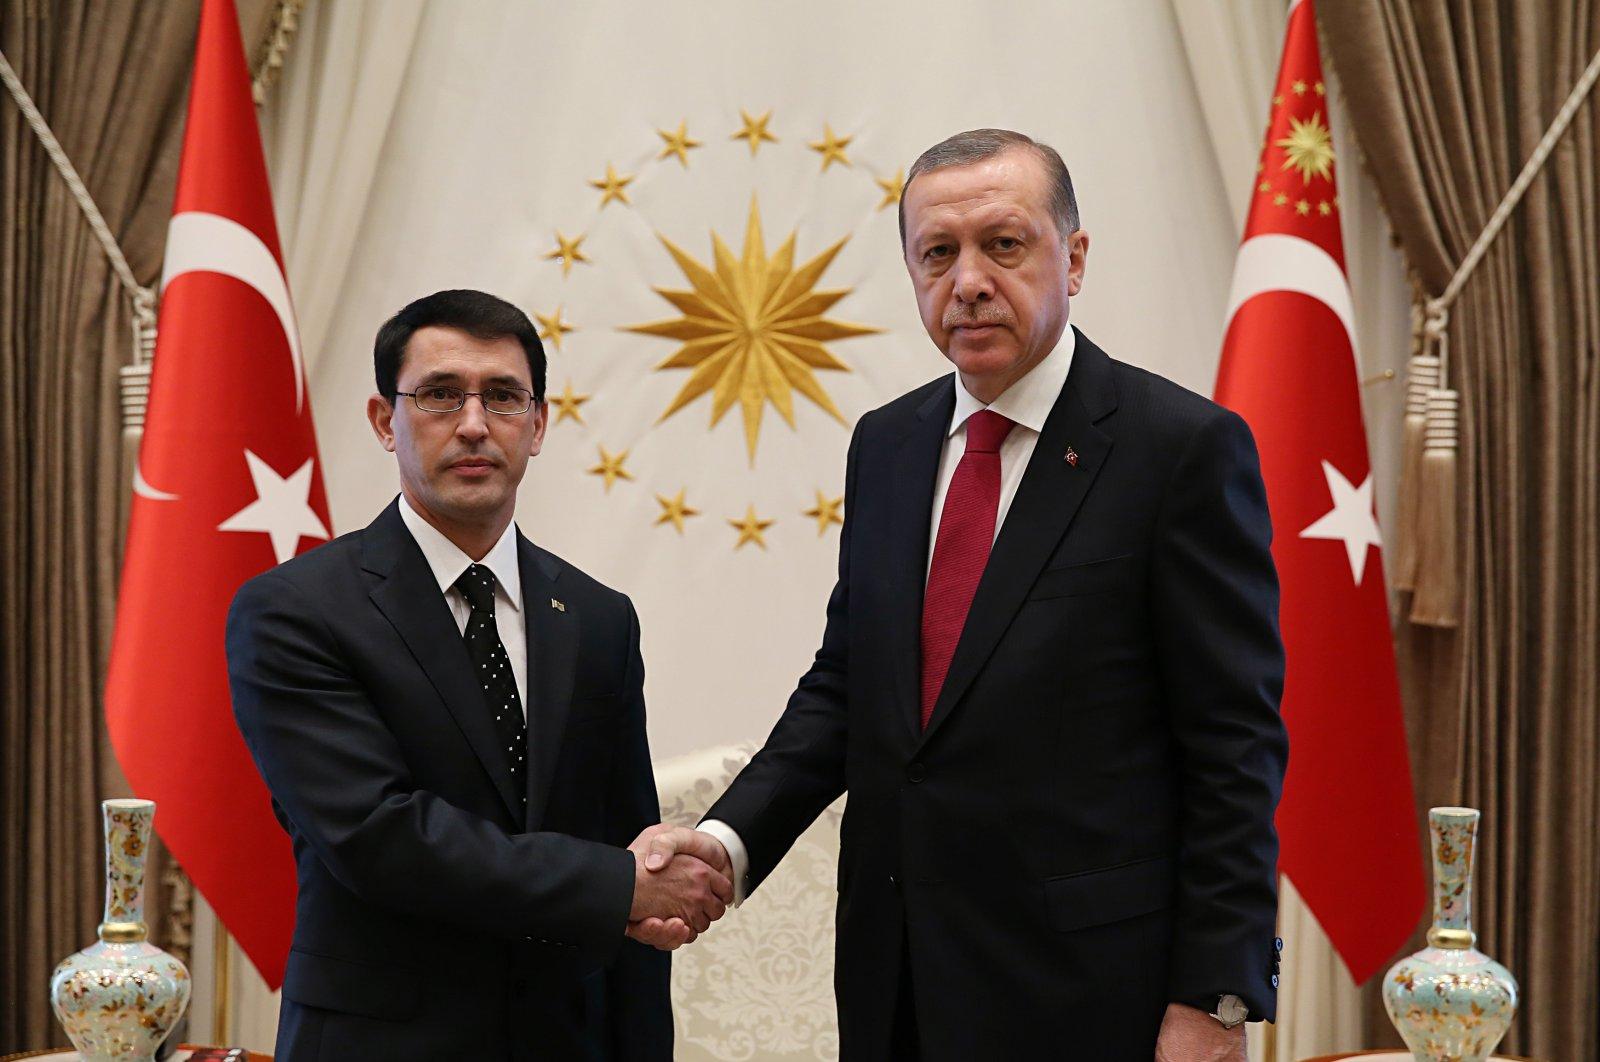 Turkmenistan's Ambassador Ishankuli Amanlyev (L) is received by President Recep Tayyip Erdoğan in the capital ankara, Turkey. (AA Photo)